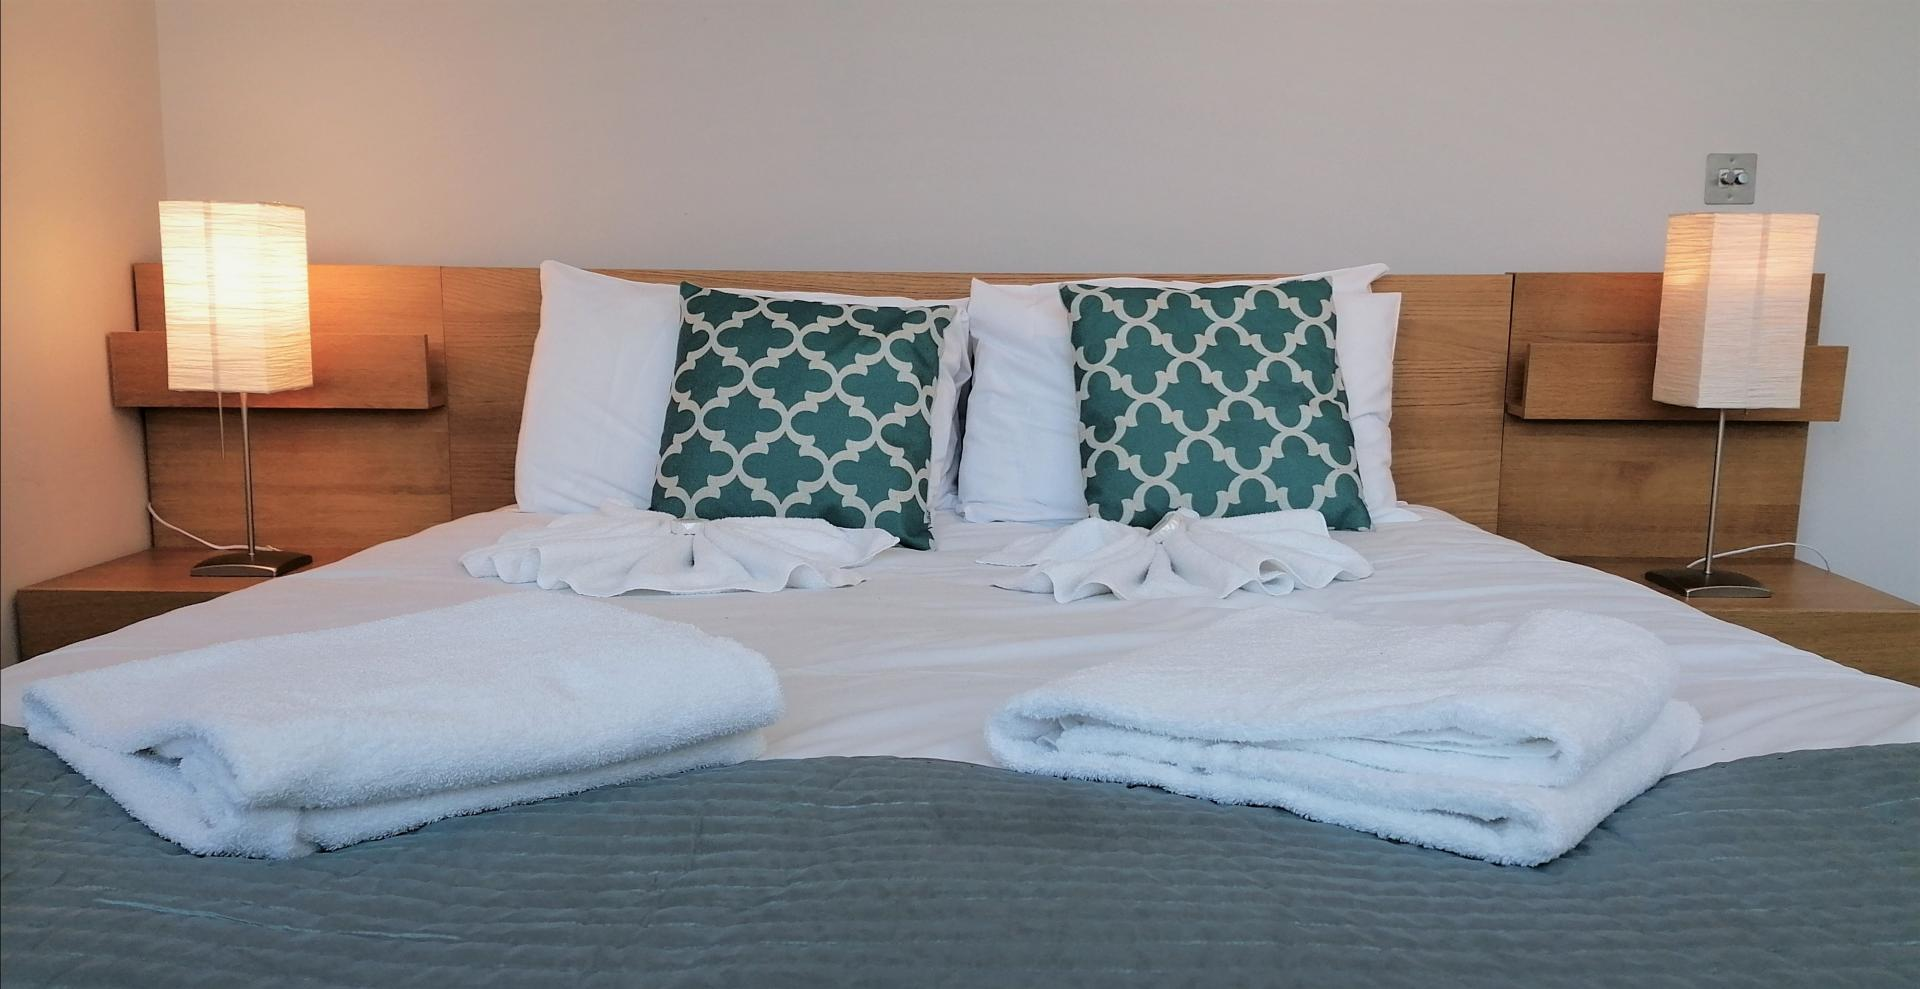 Bed at Still Life King's Cross Superior Apartment, Kings Cross St Pancras, London - Citybase Apartments